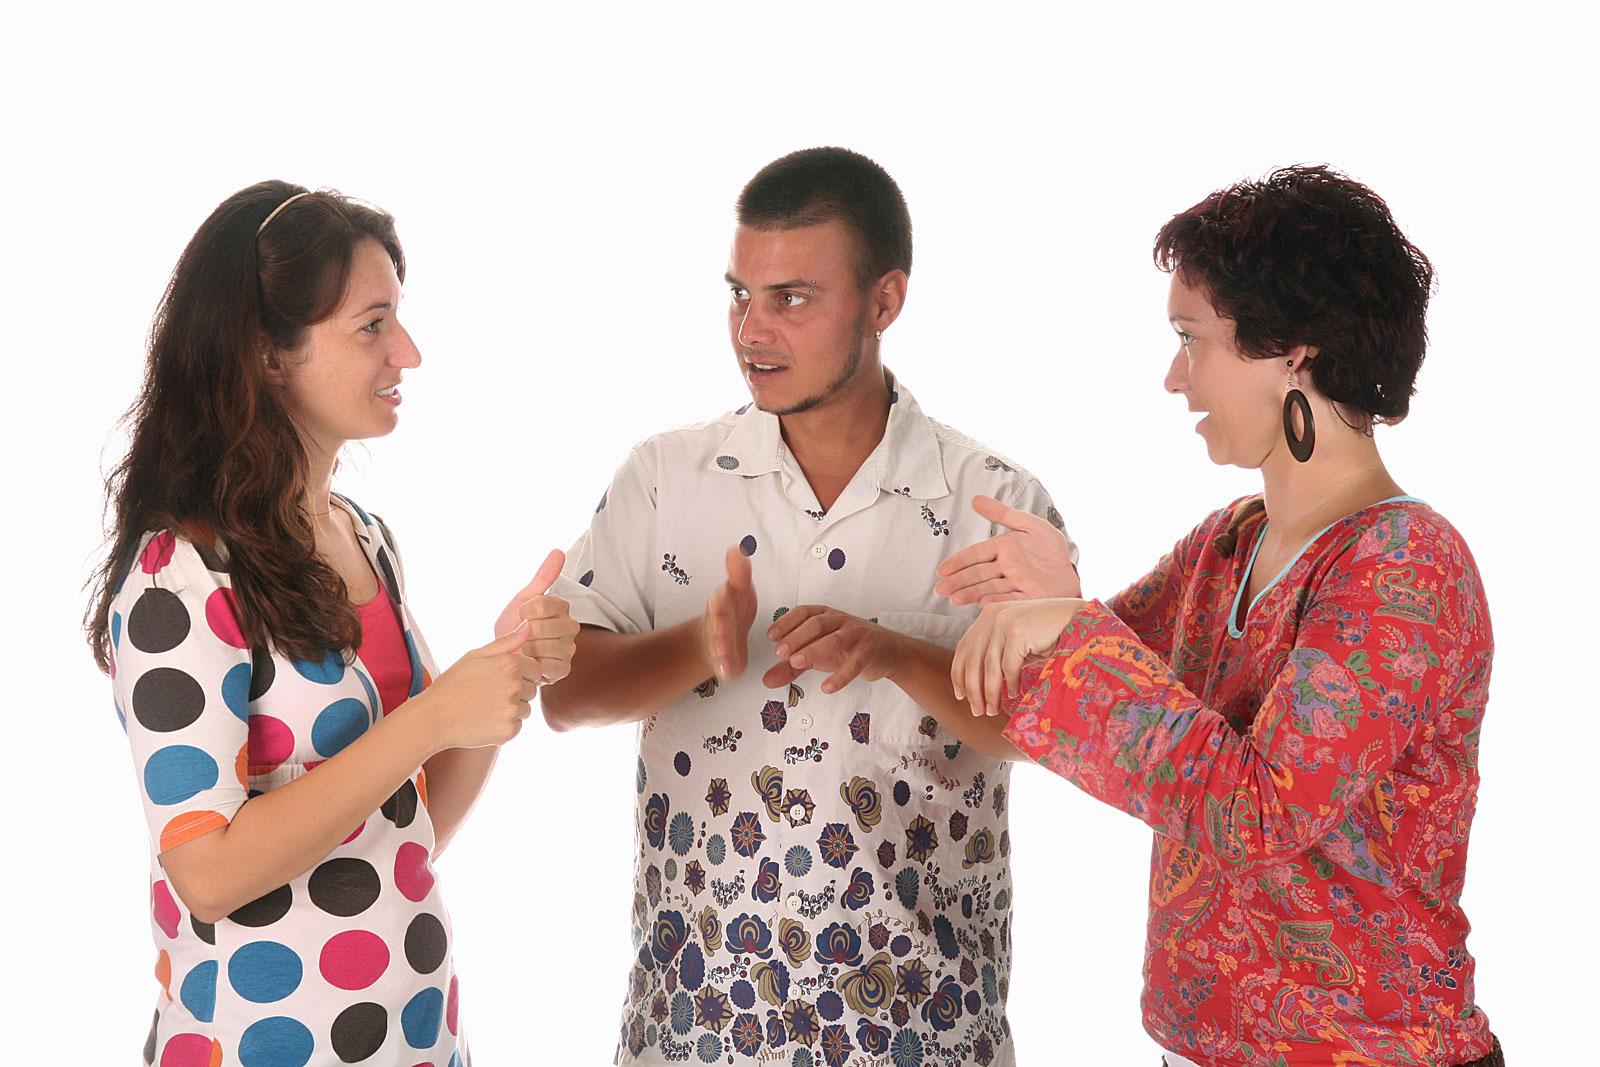 знакомство с глухими людьми